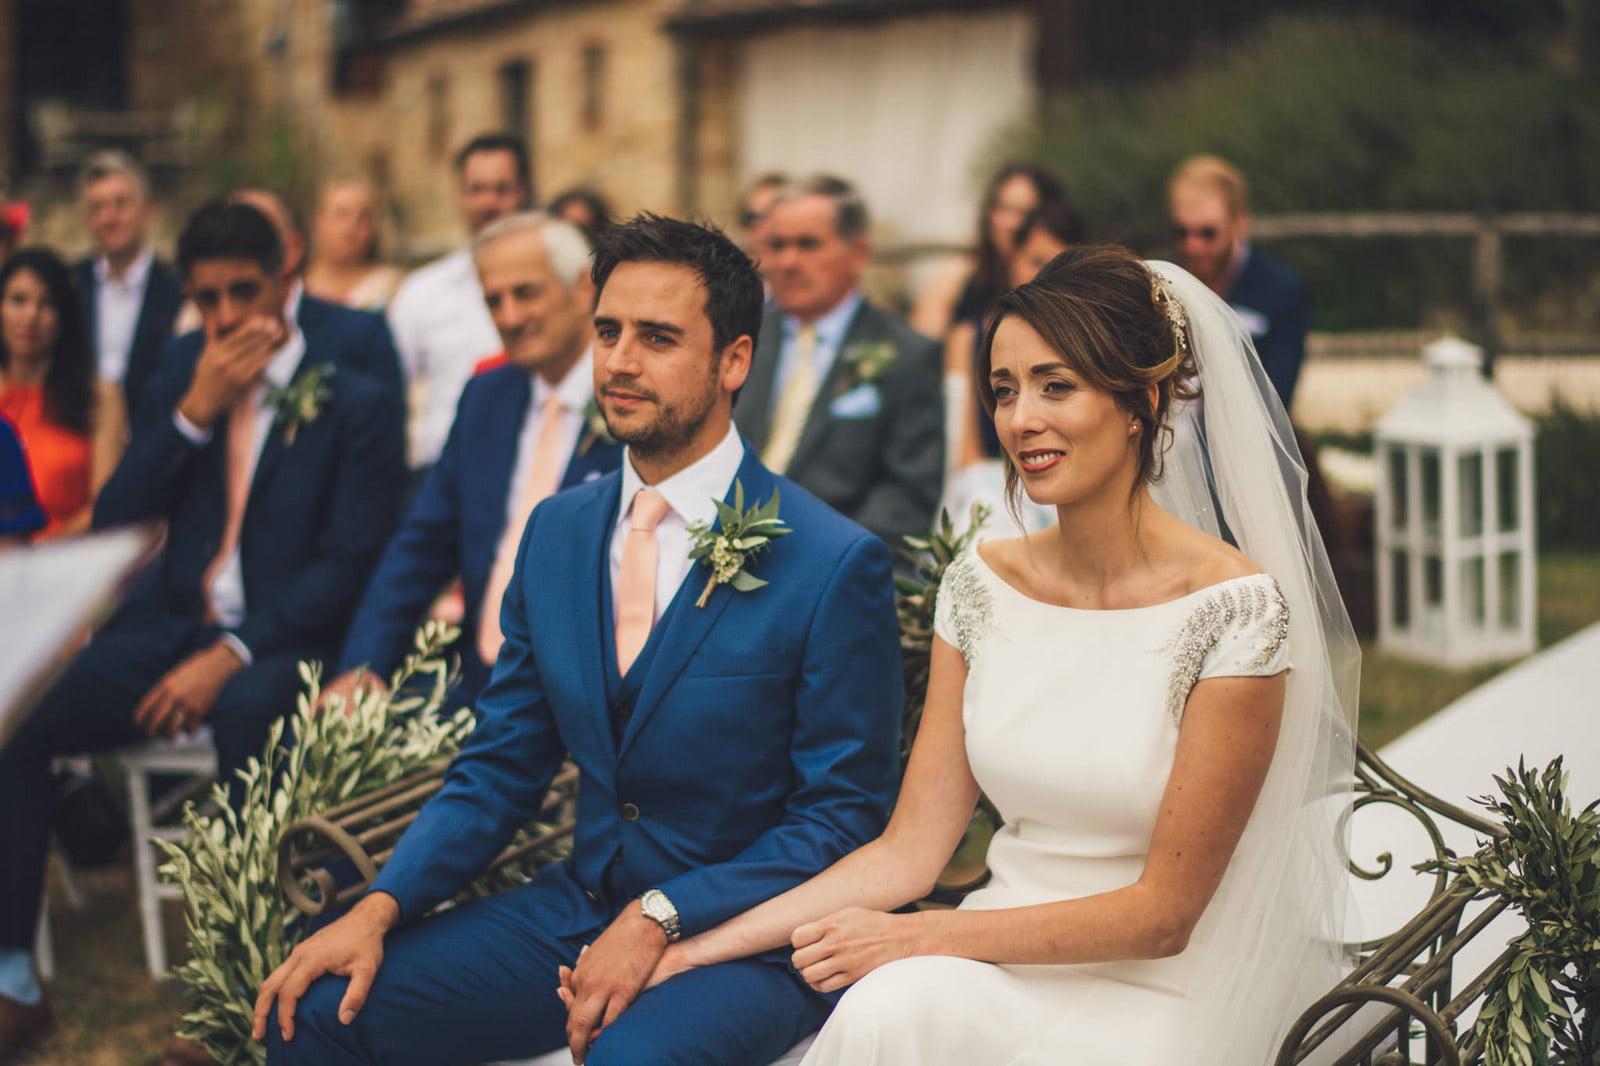 054-wedding-tuscany-san-galgano-federico-pannacci-photographer